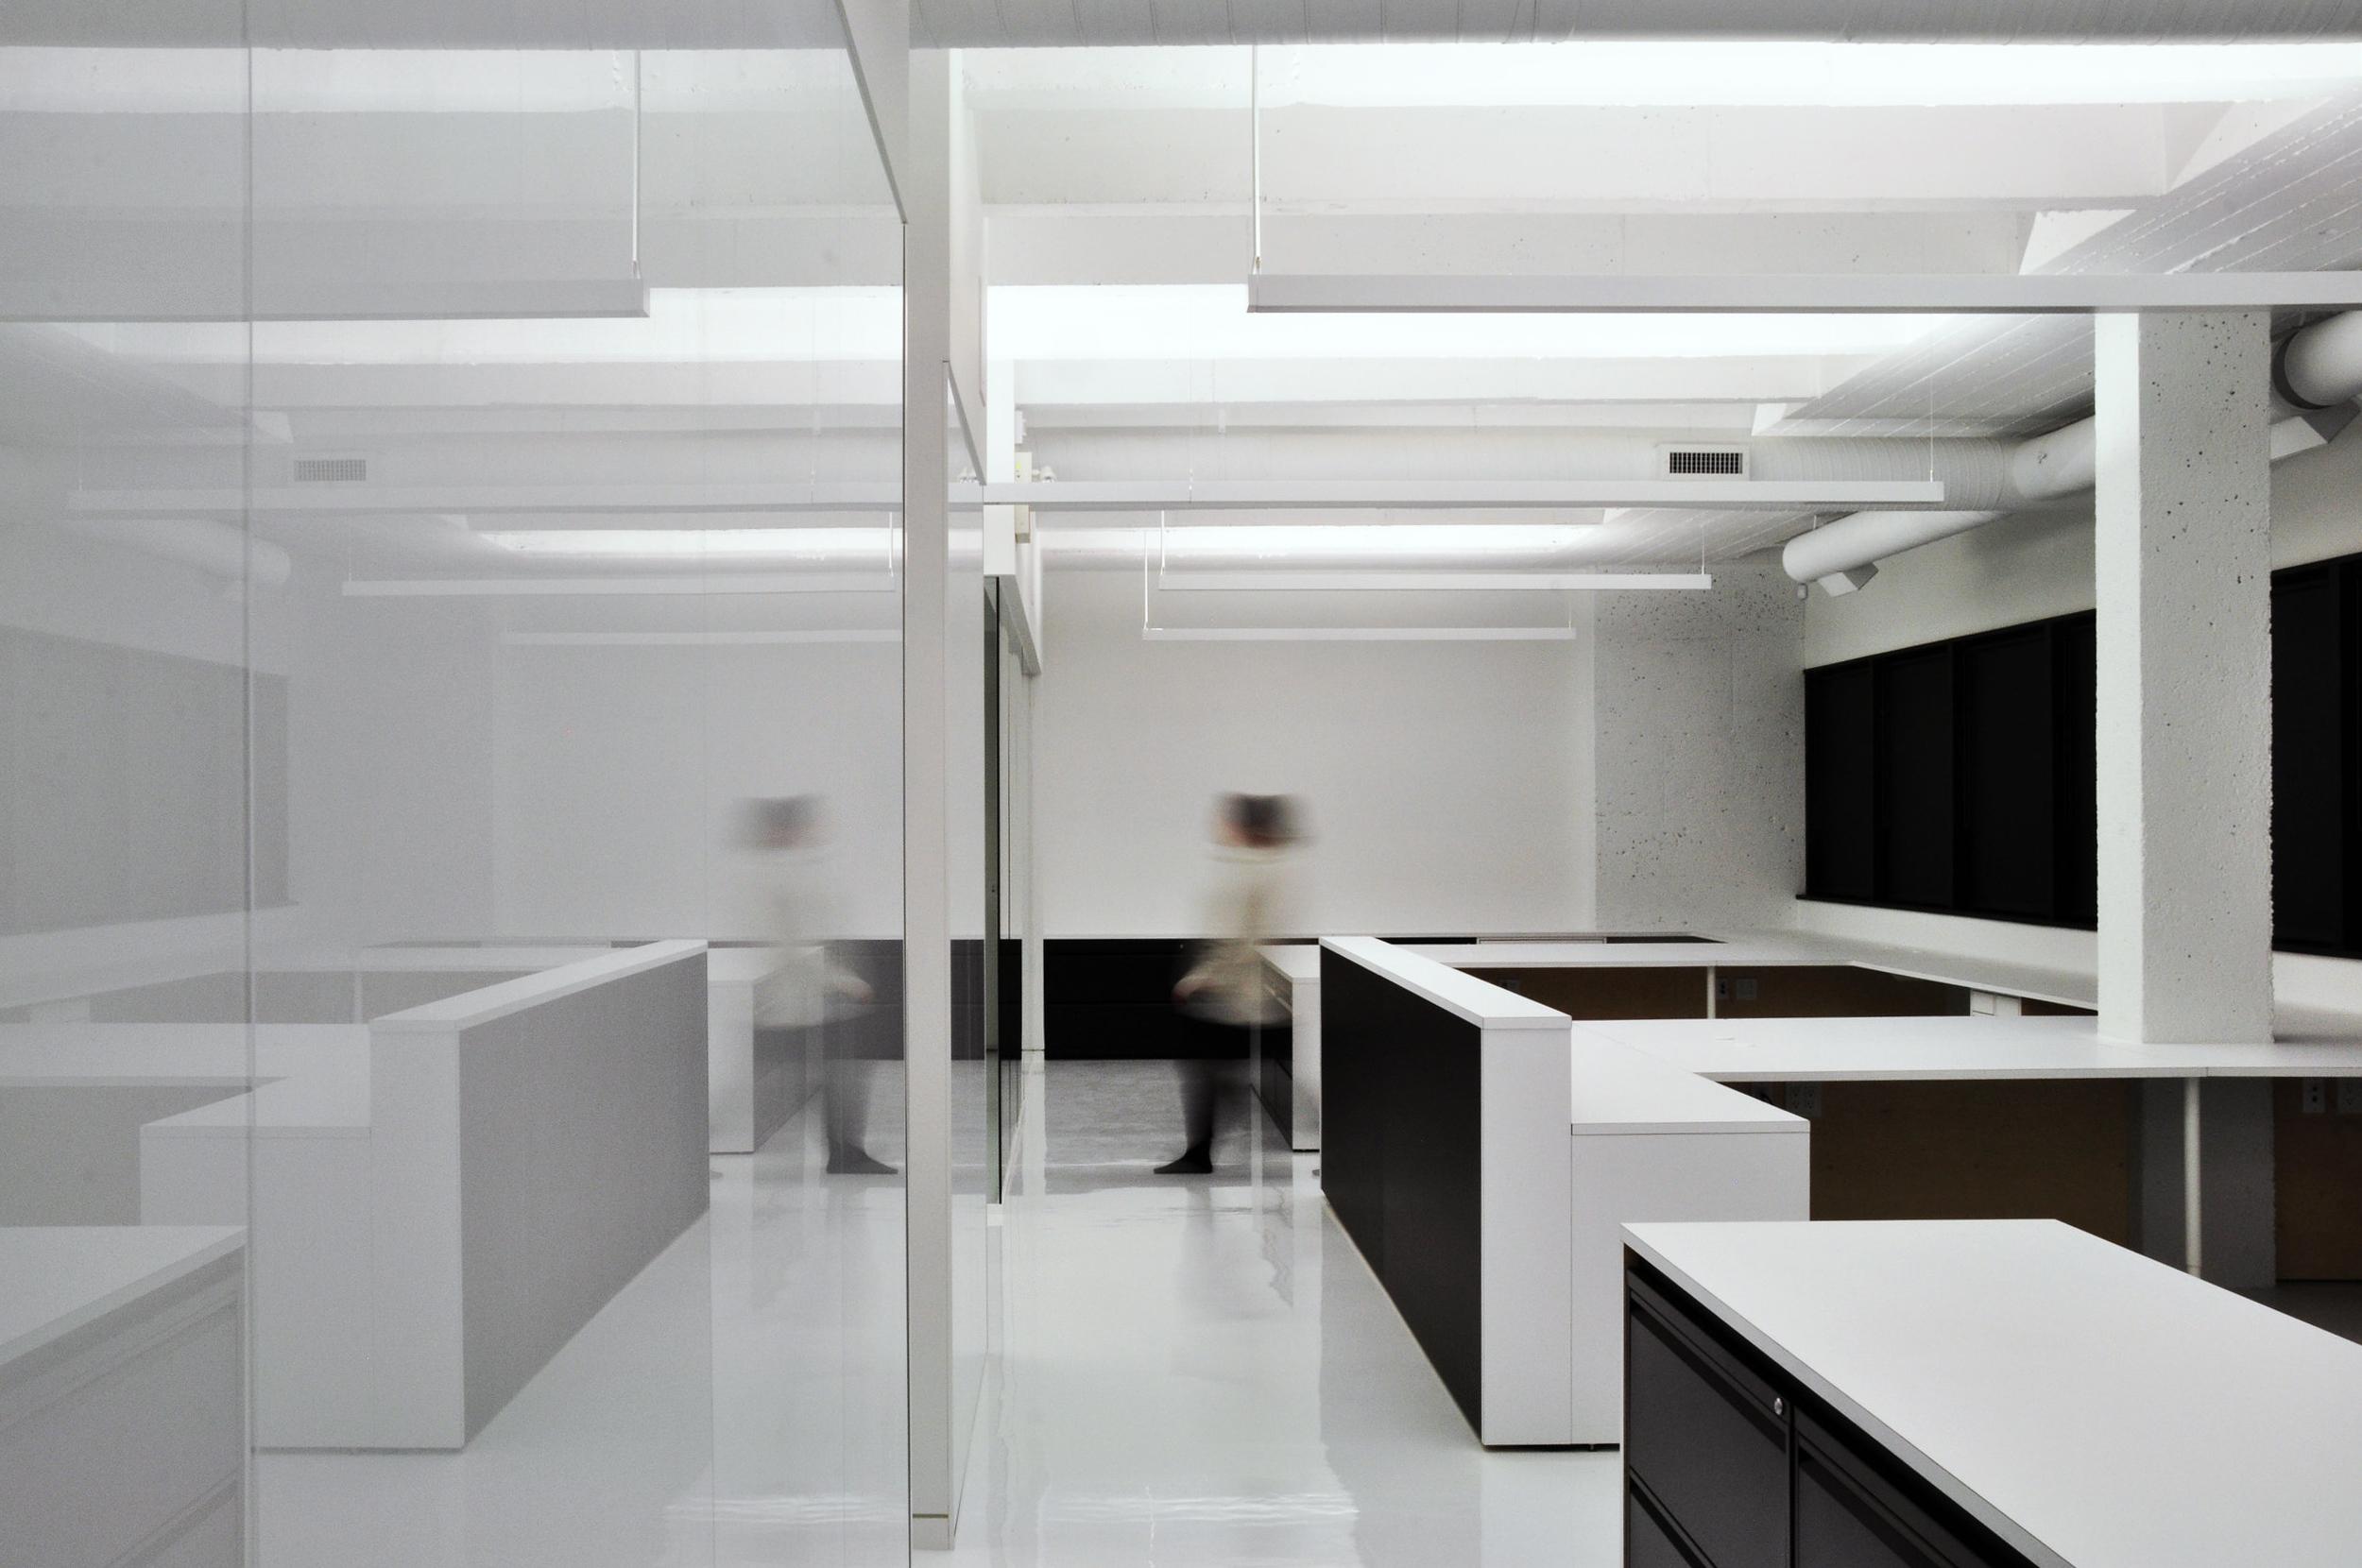 OFFICE DESIGN CUSTOM FURNITURE BUILT-IN CABINETRY VANCOUVER ANTHILL STUDIO DESIGN LOCAL